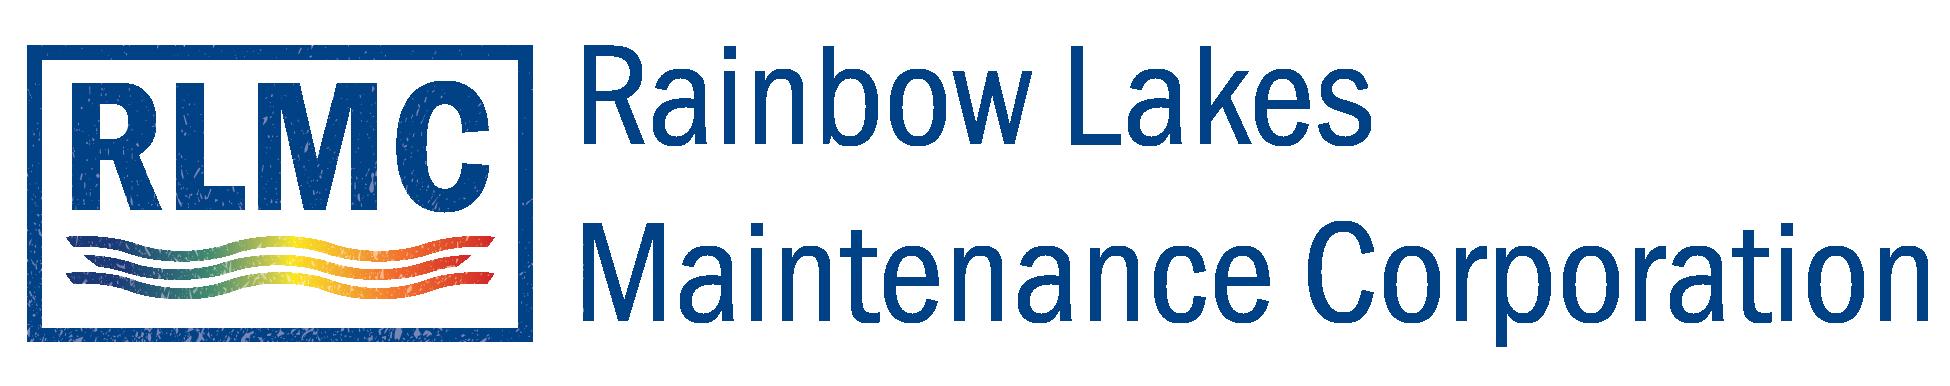 Rainbow Lakes Maintenance Corporation